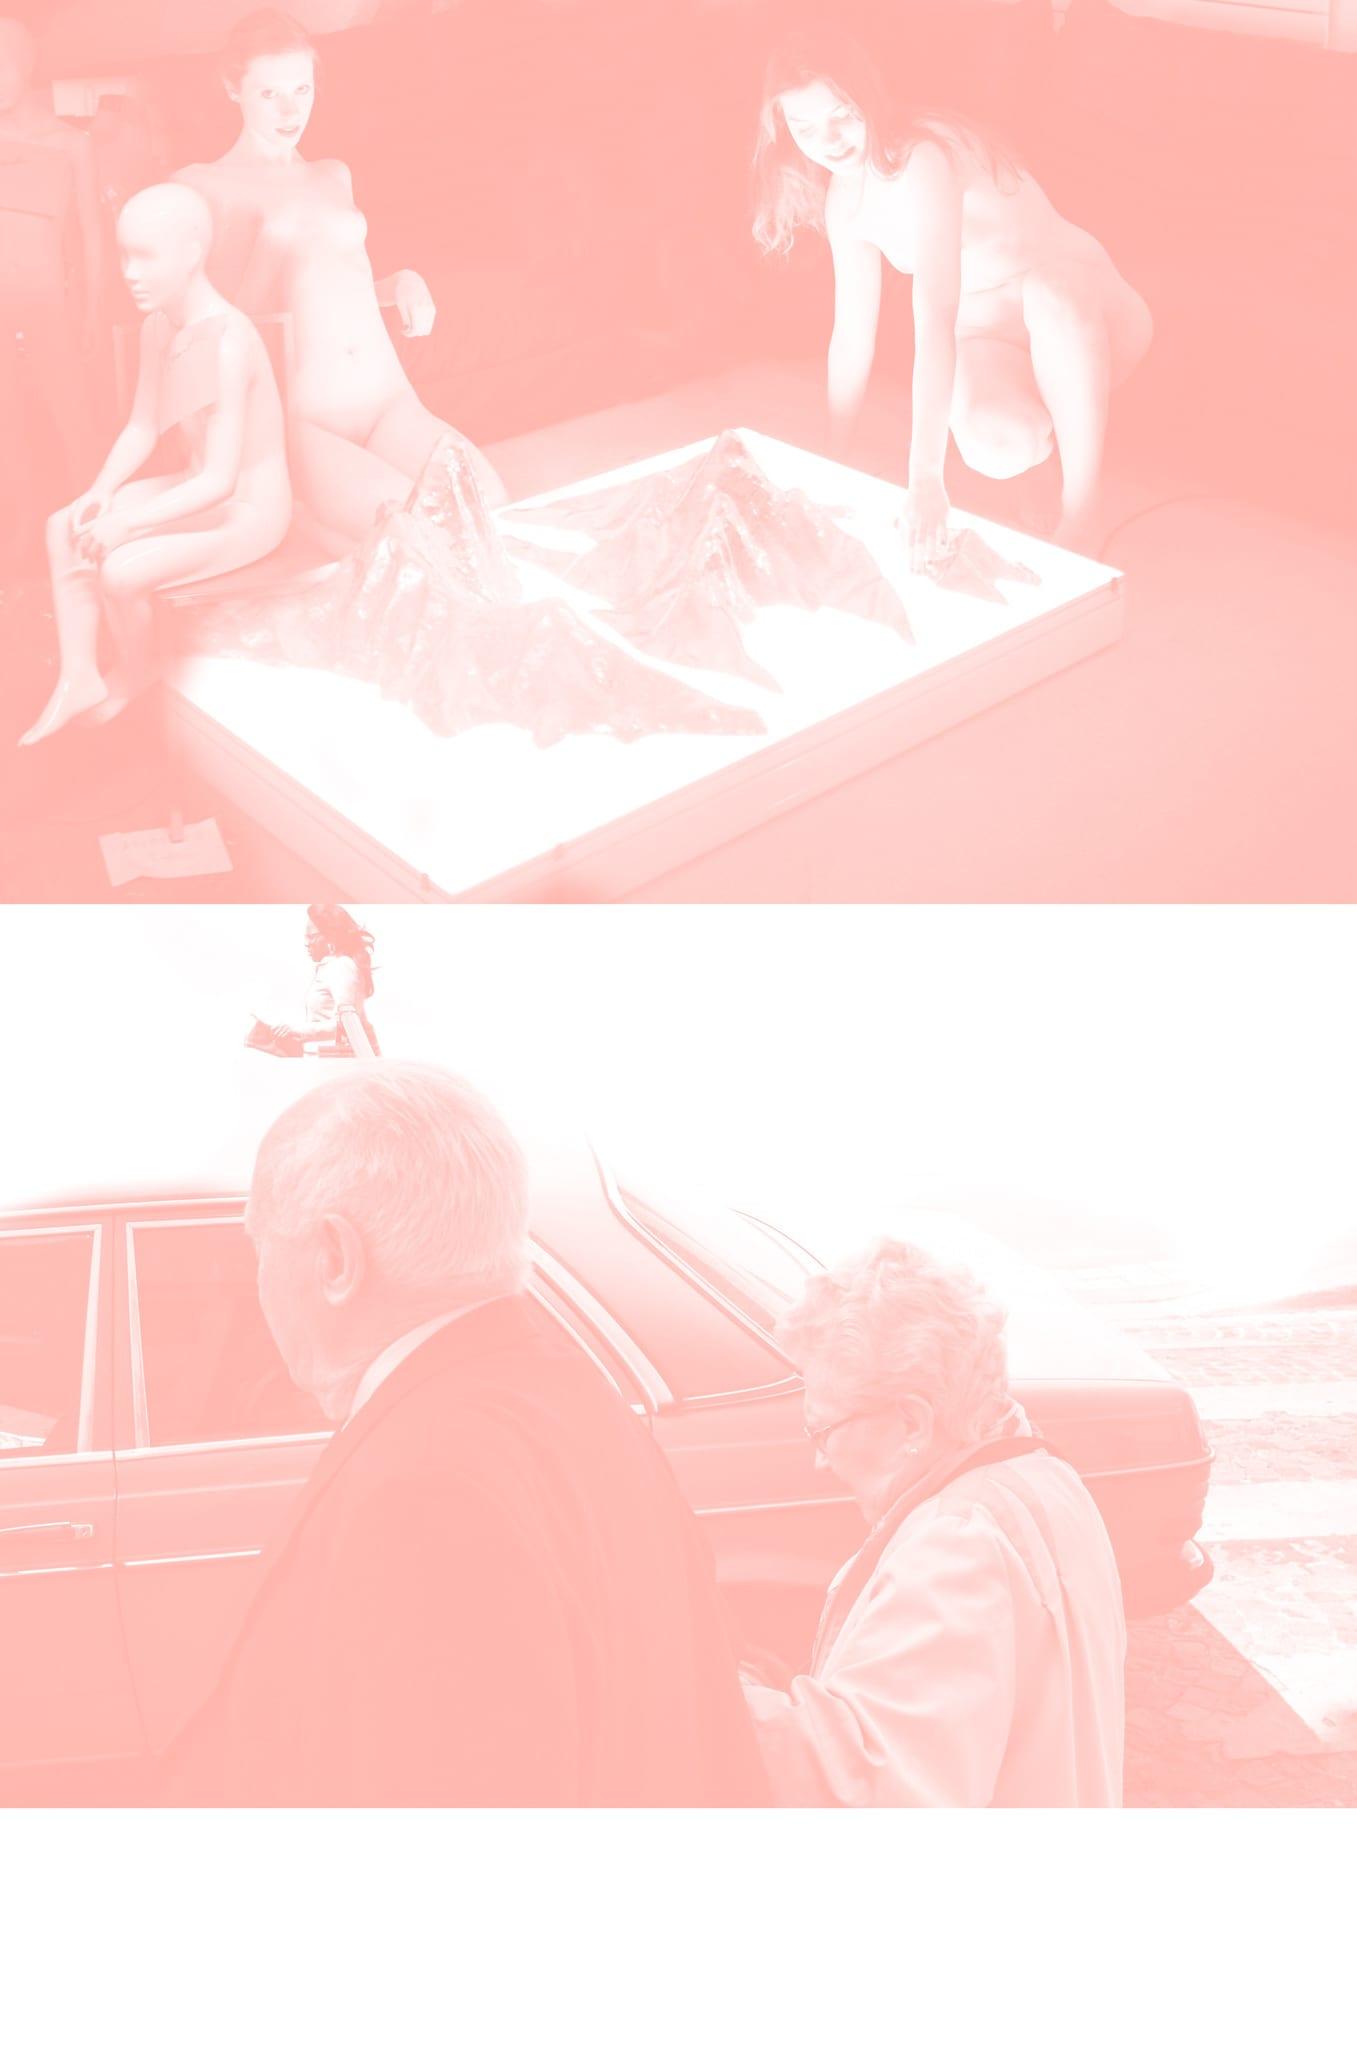 Sublimation thermique (7) by Julien Carreyn